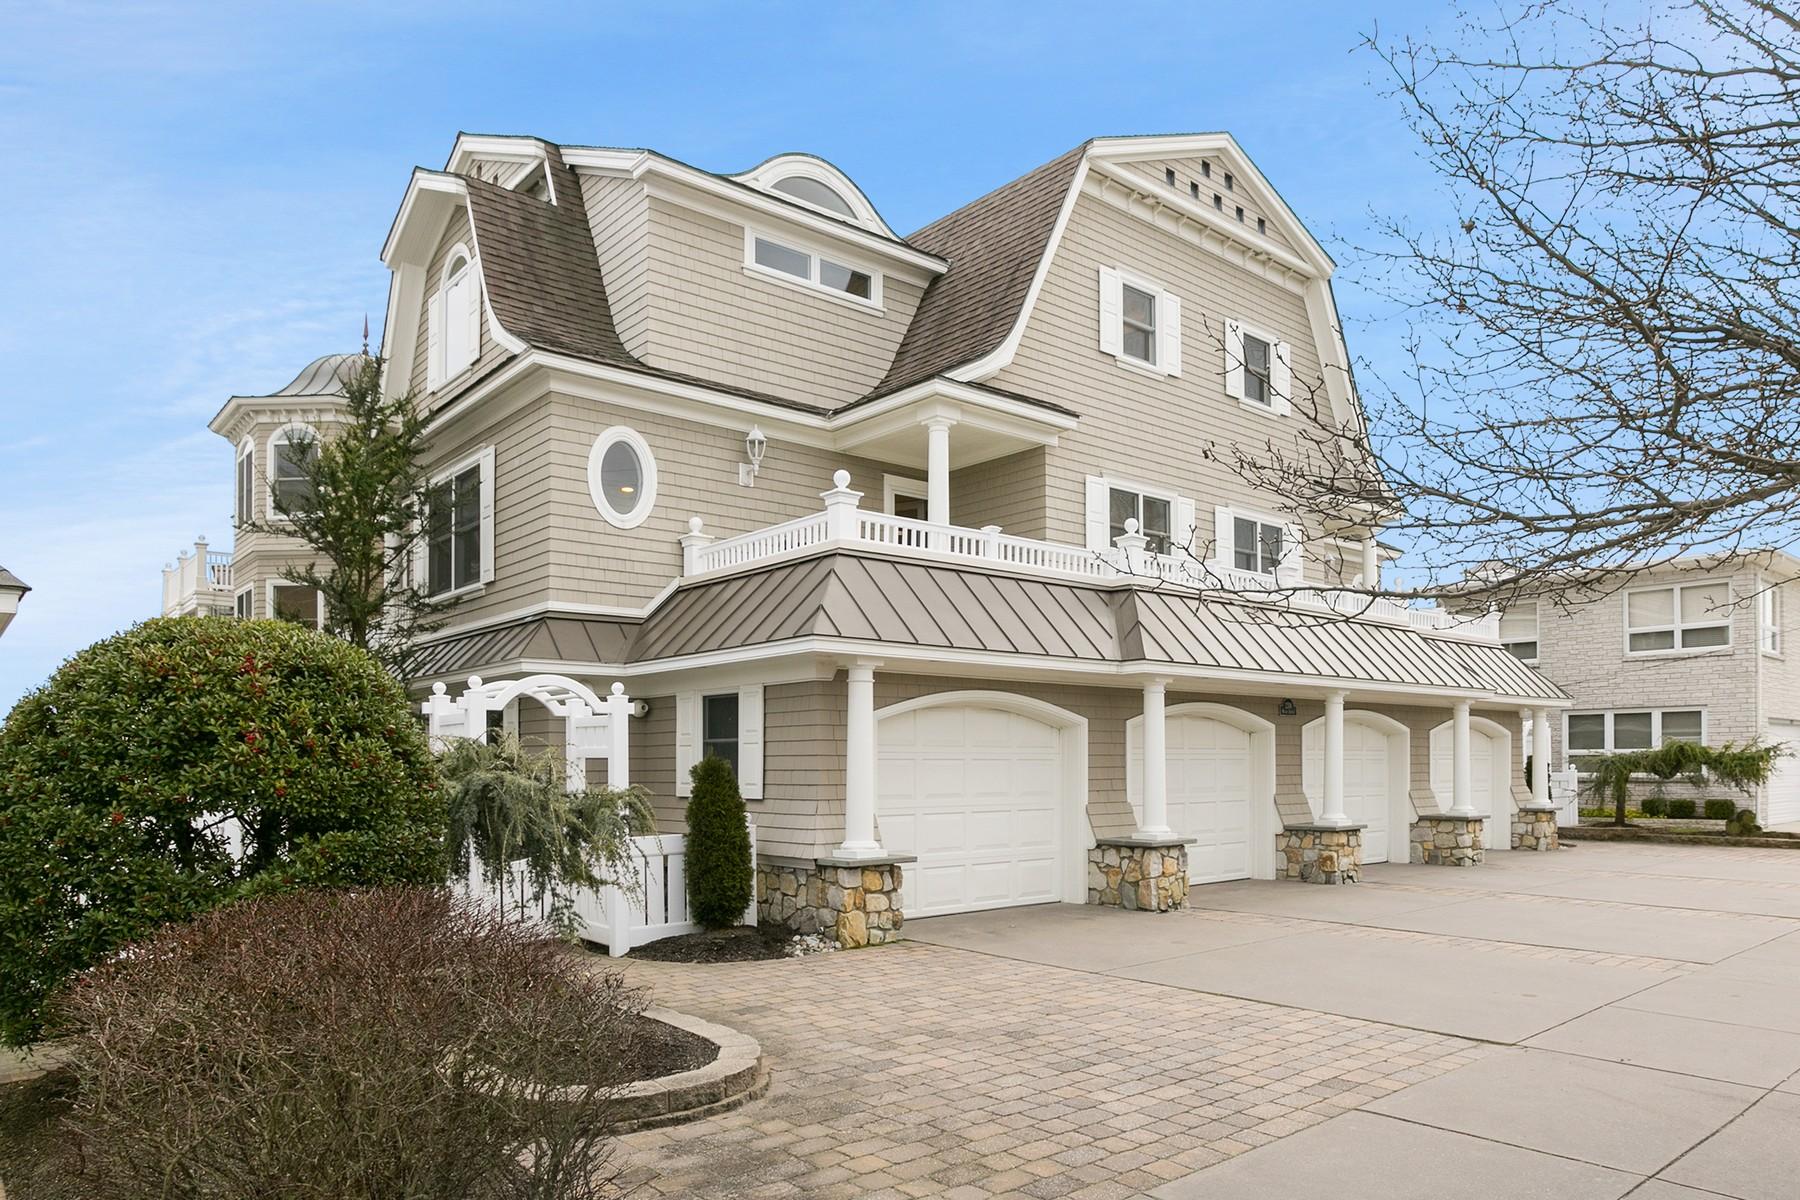 共管式独立产权公寓 为 销售 在 Beachfront Town Home 2319 Wesley Avenue North Ocean City, 08226 美国